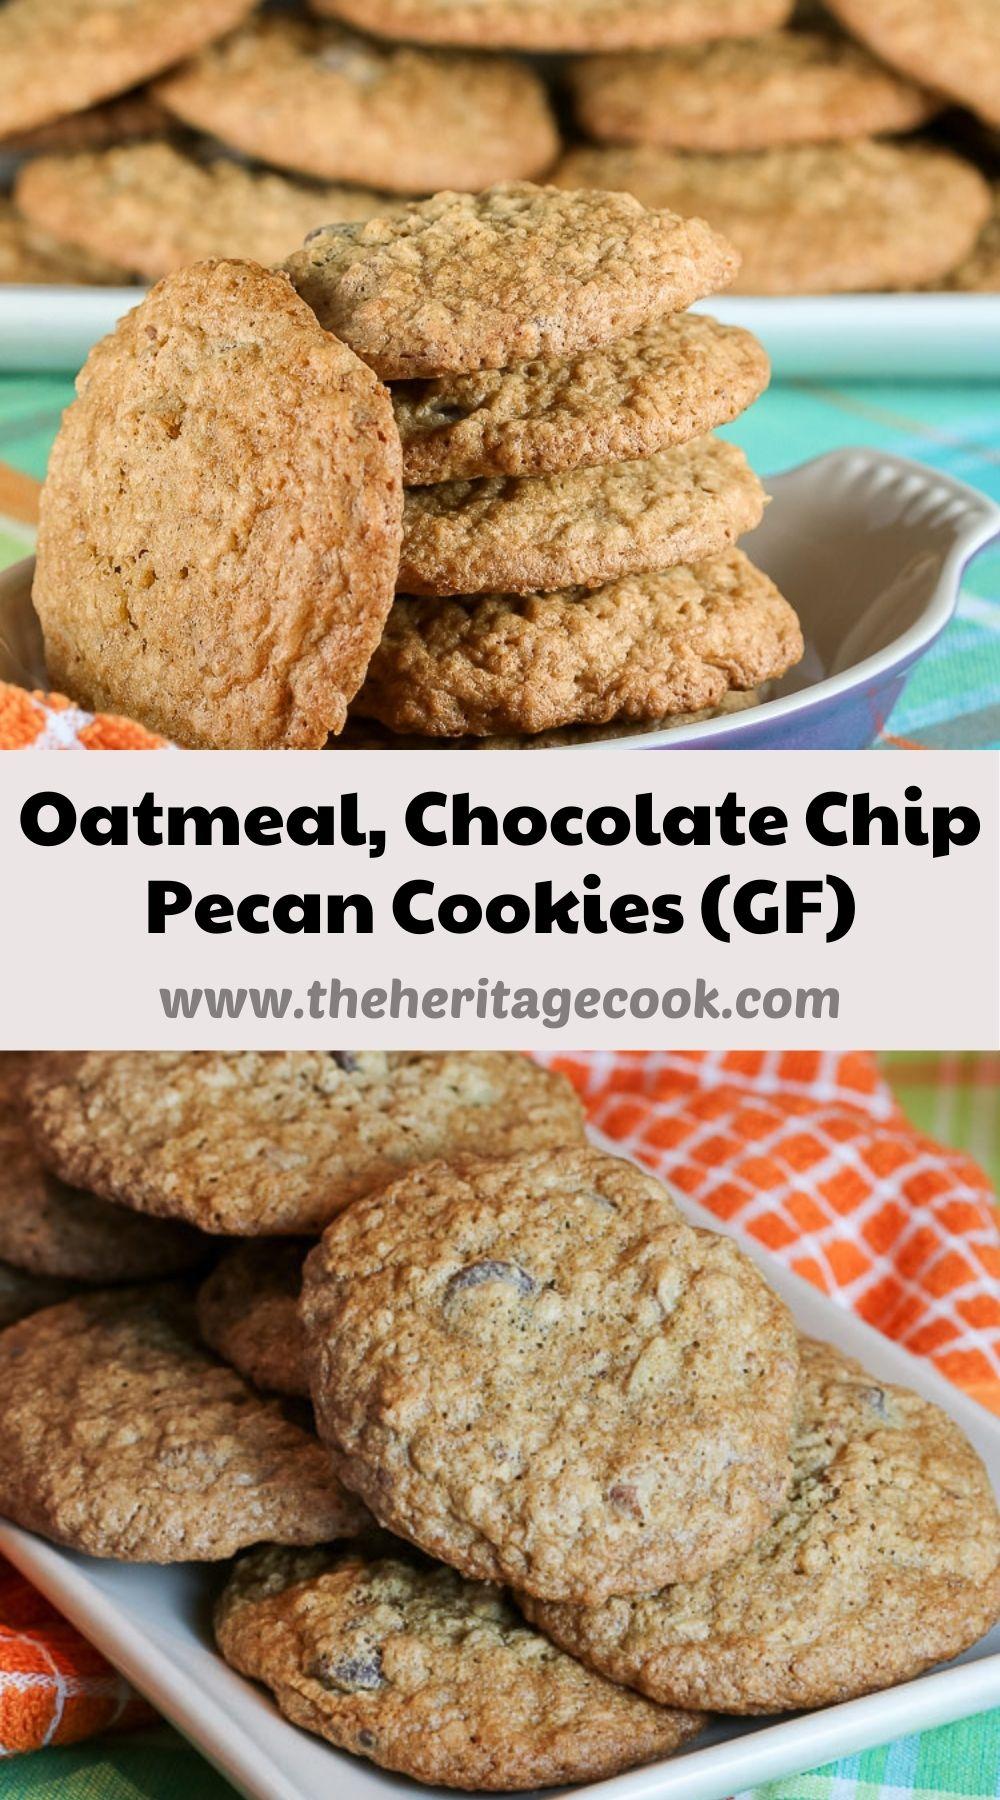 Oatmeal Chocolate Chip Pecan Cookies © 2021 Jane Bonacci, The Heritage Cook